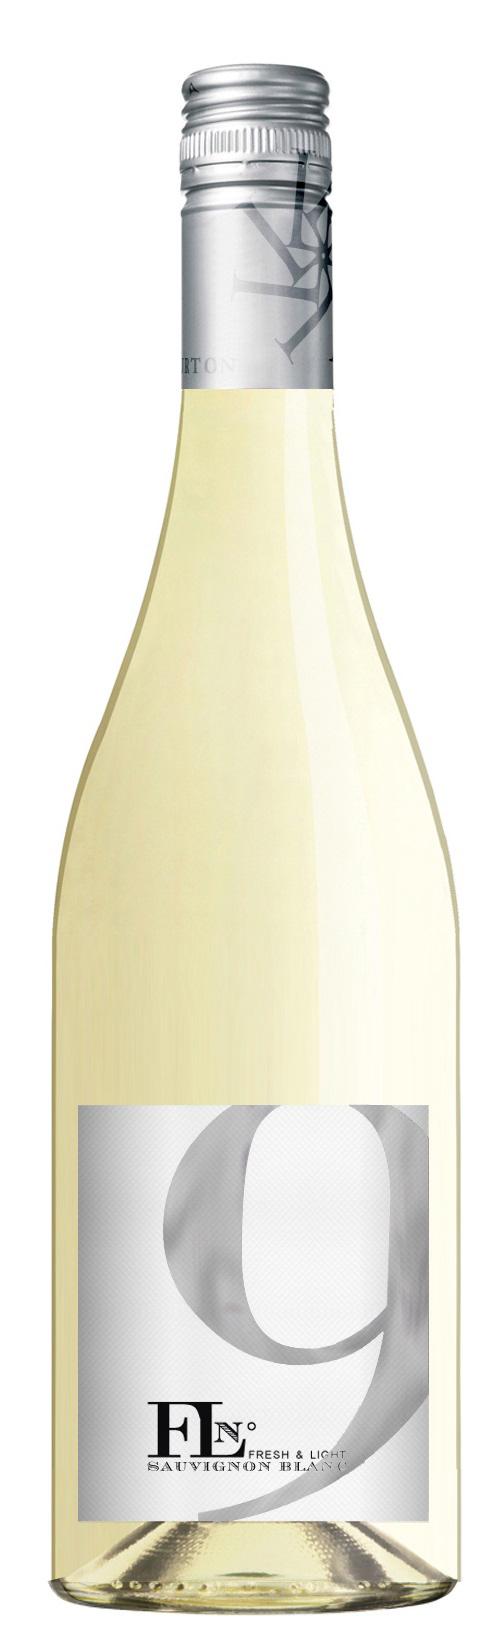 Francois Lurton FL N9 Sauvignon Blanc